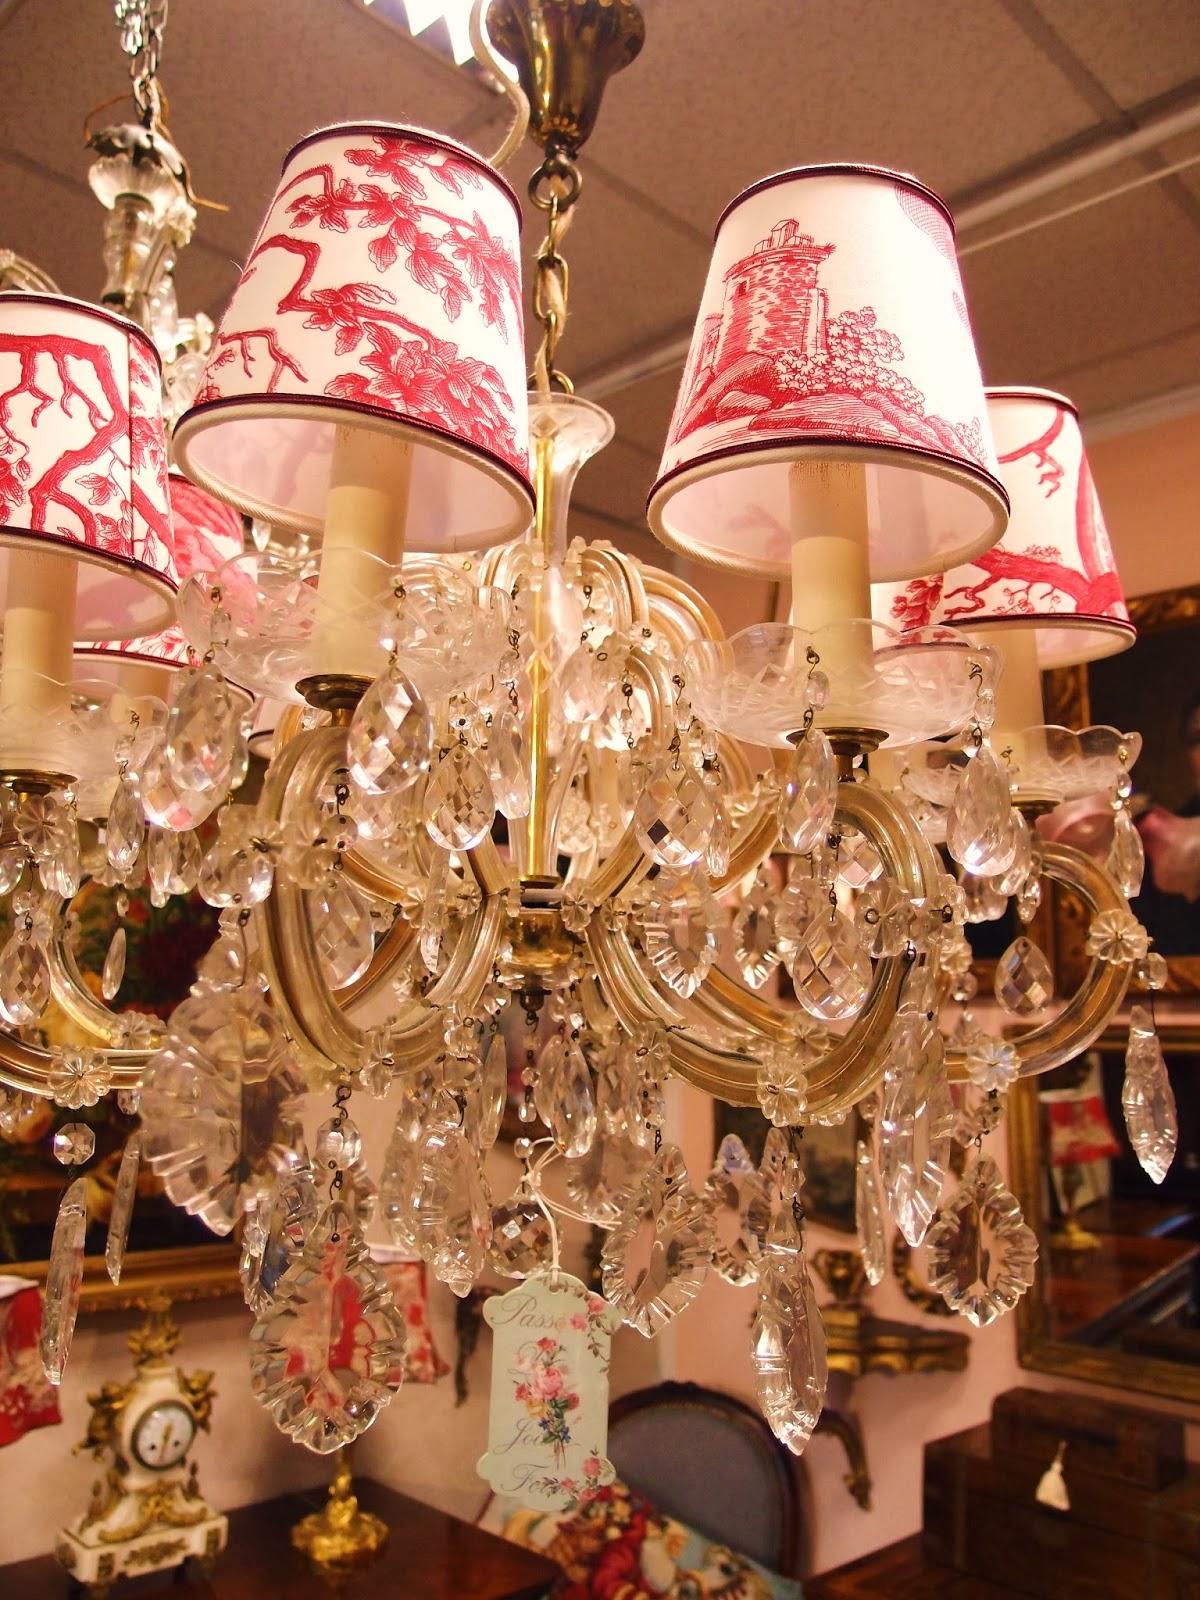 lampadari rimini : Lampadario Maria Teresa con gocce in cristallo